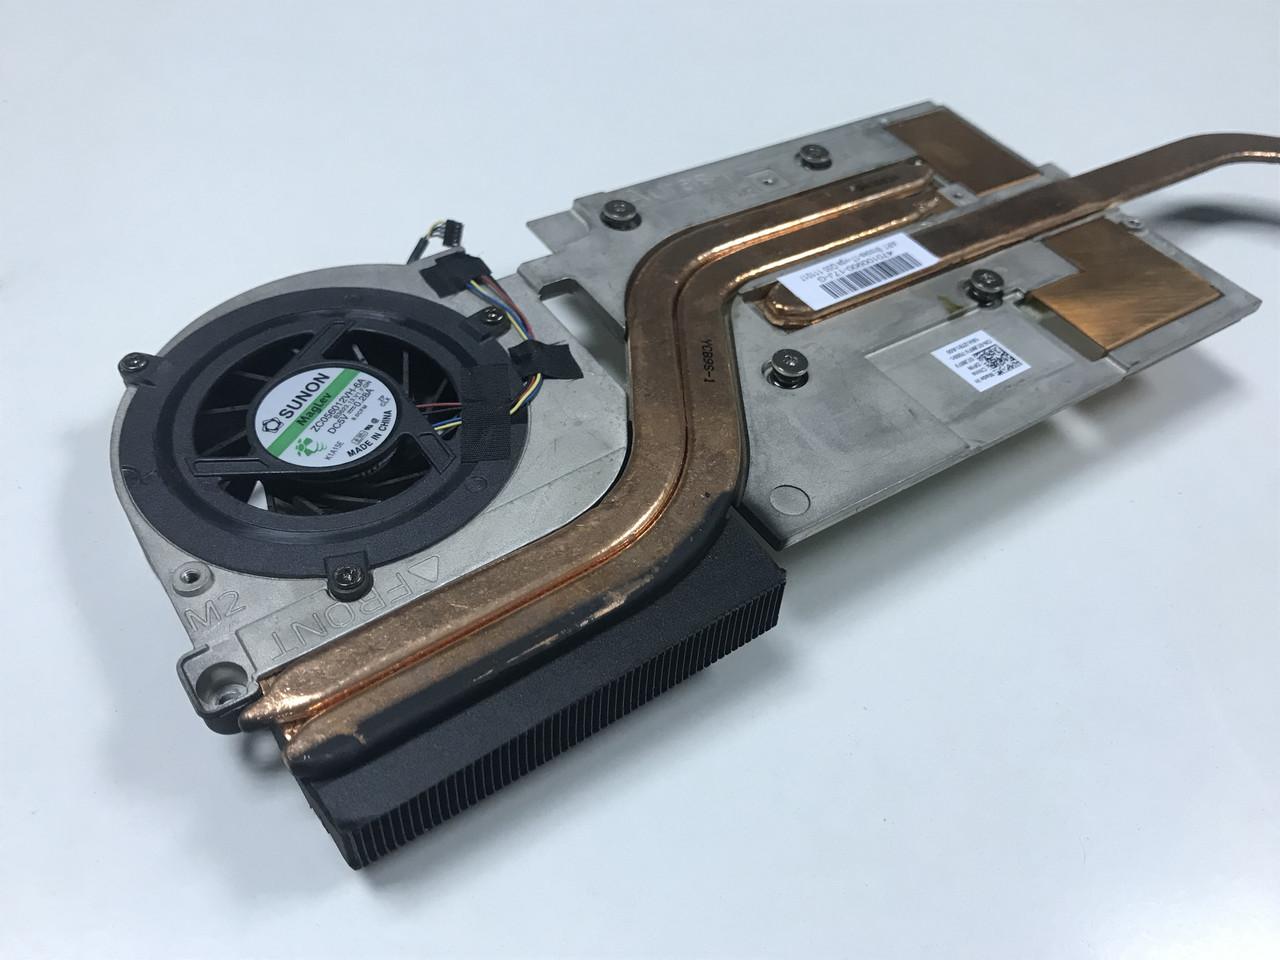 Система охлаждения кулер, радиатор для ноутбука Dell Precission M6600 (AMD ATI Firepro M8900)